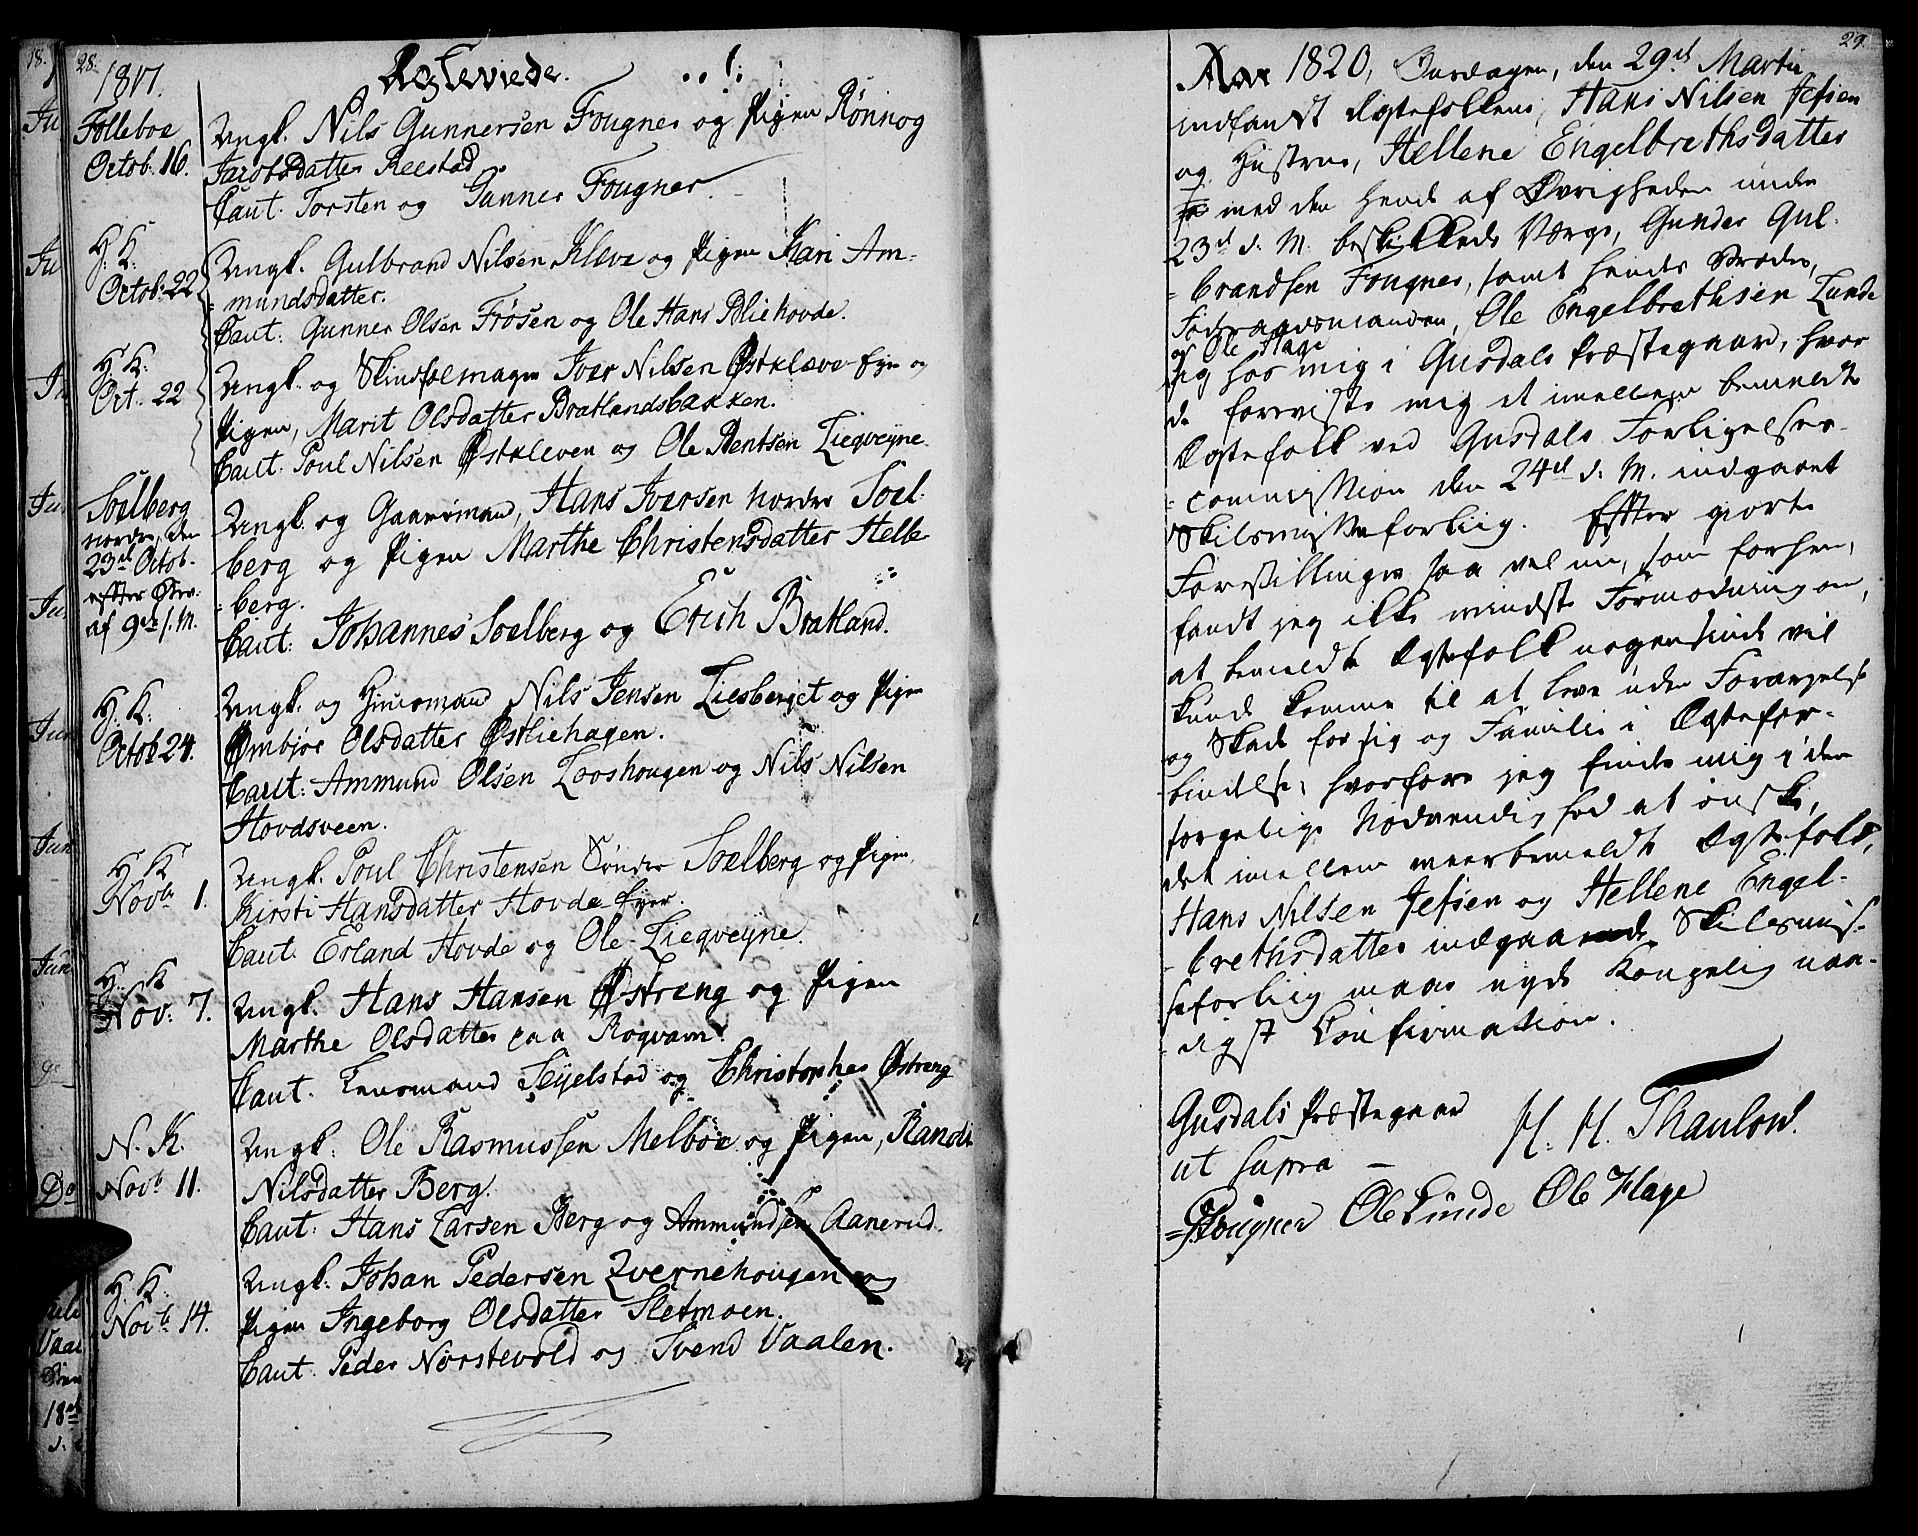 SAH, Gausdal prestekontor, Ministerialbok nr. 4, 1809-1817, s. 28-29